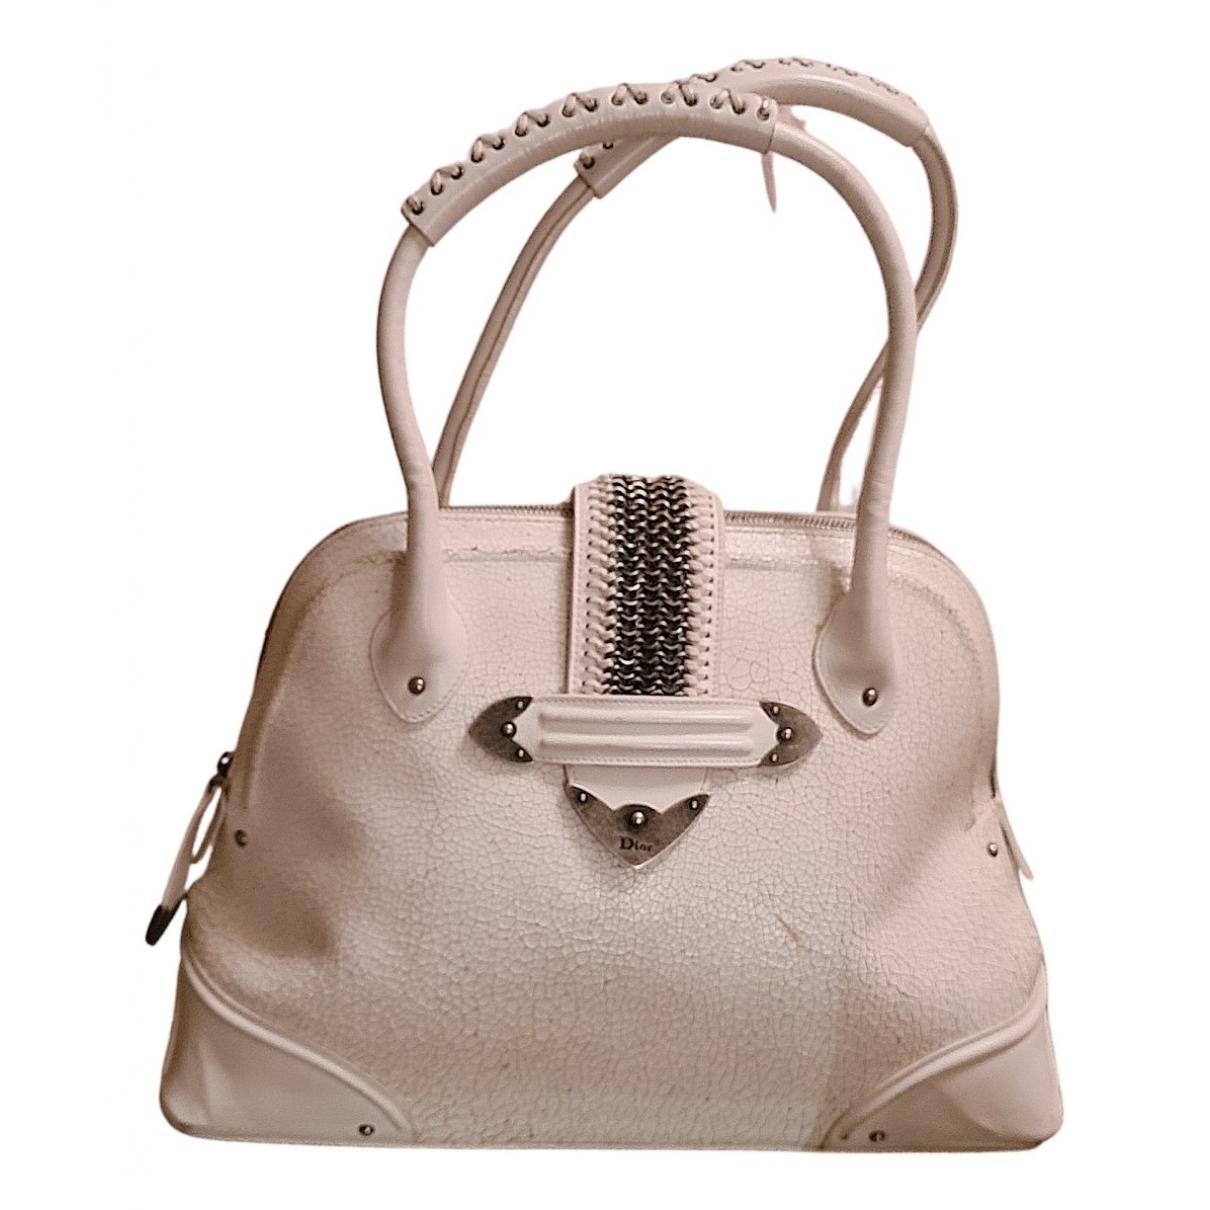 Dior N White Leather handbag for Women N